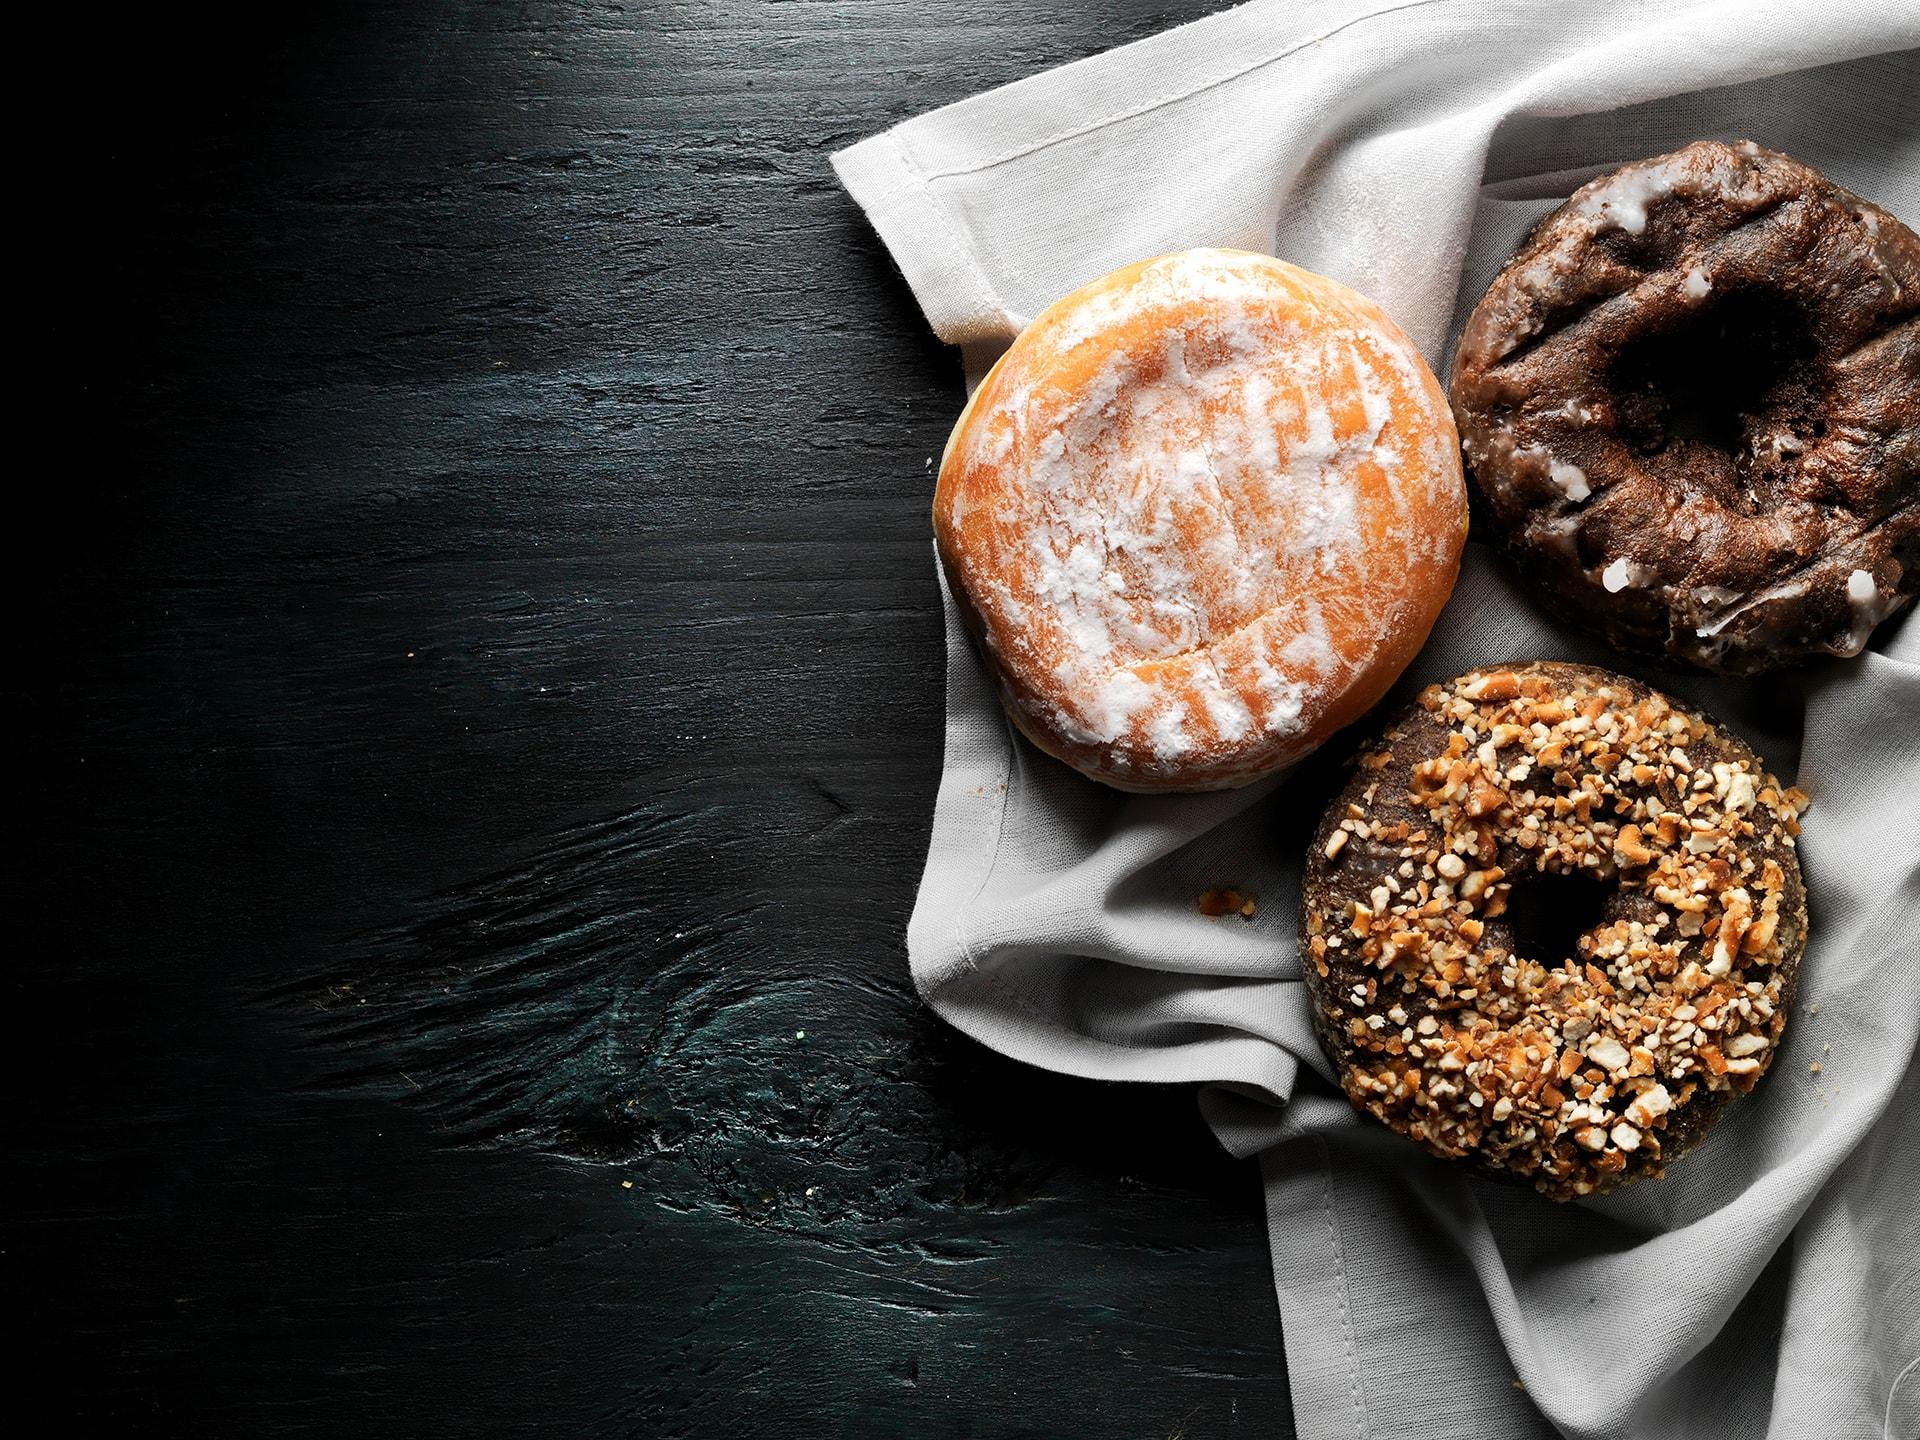 sweet-donuts-food-photography-miami-marcel-boldu.jpg